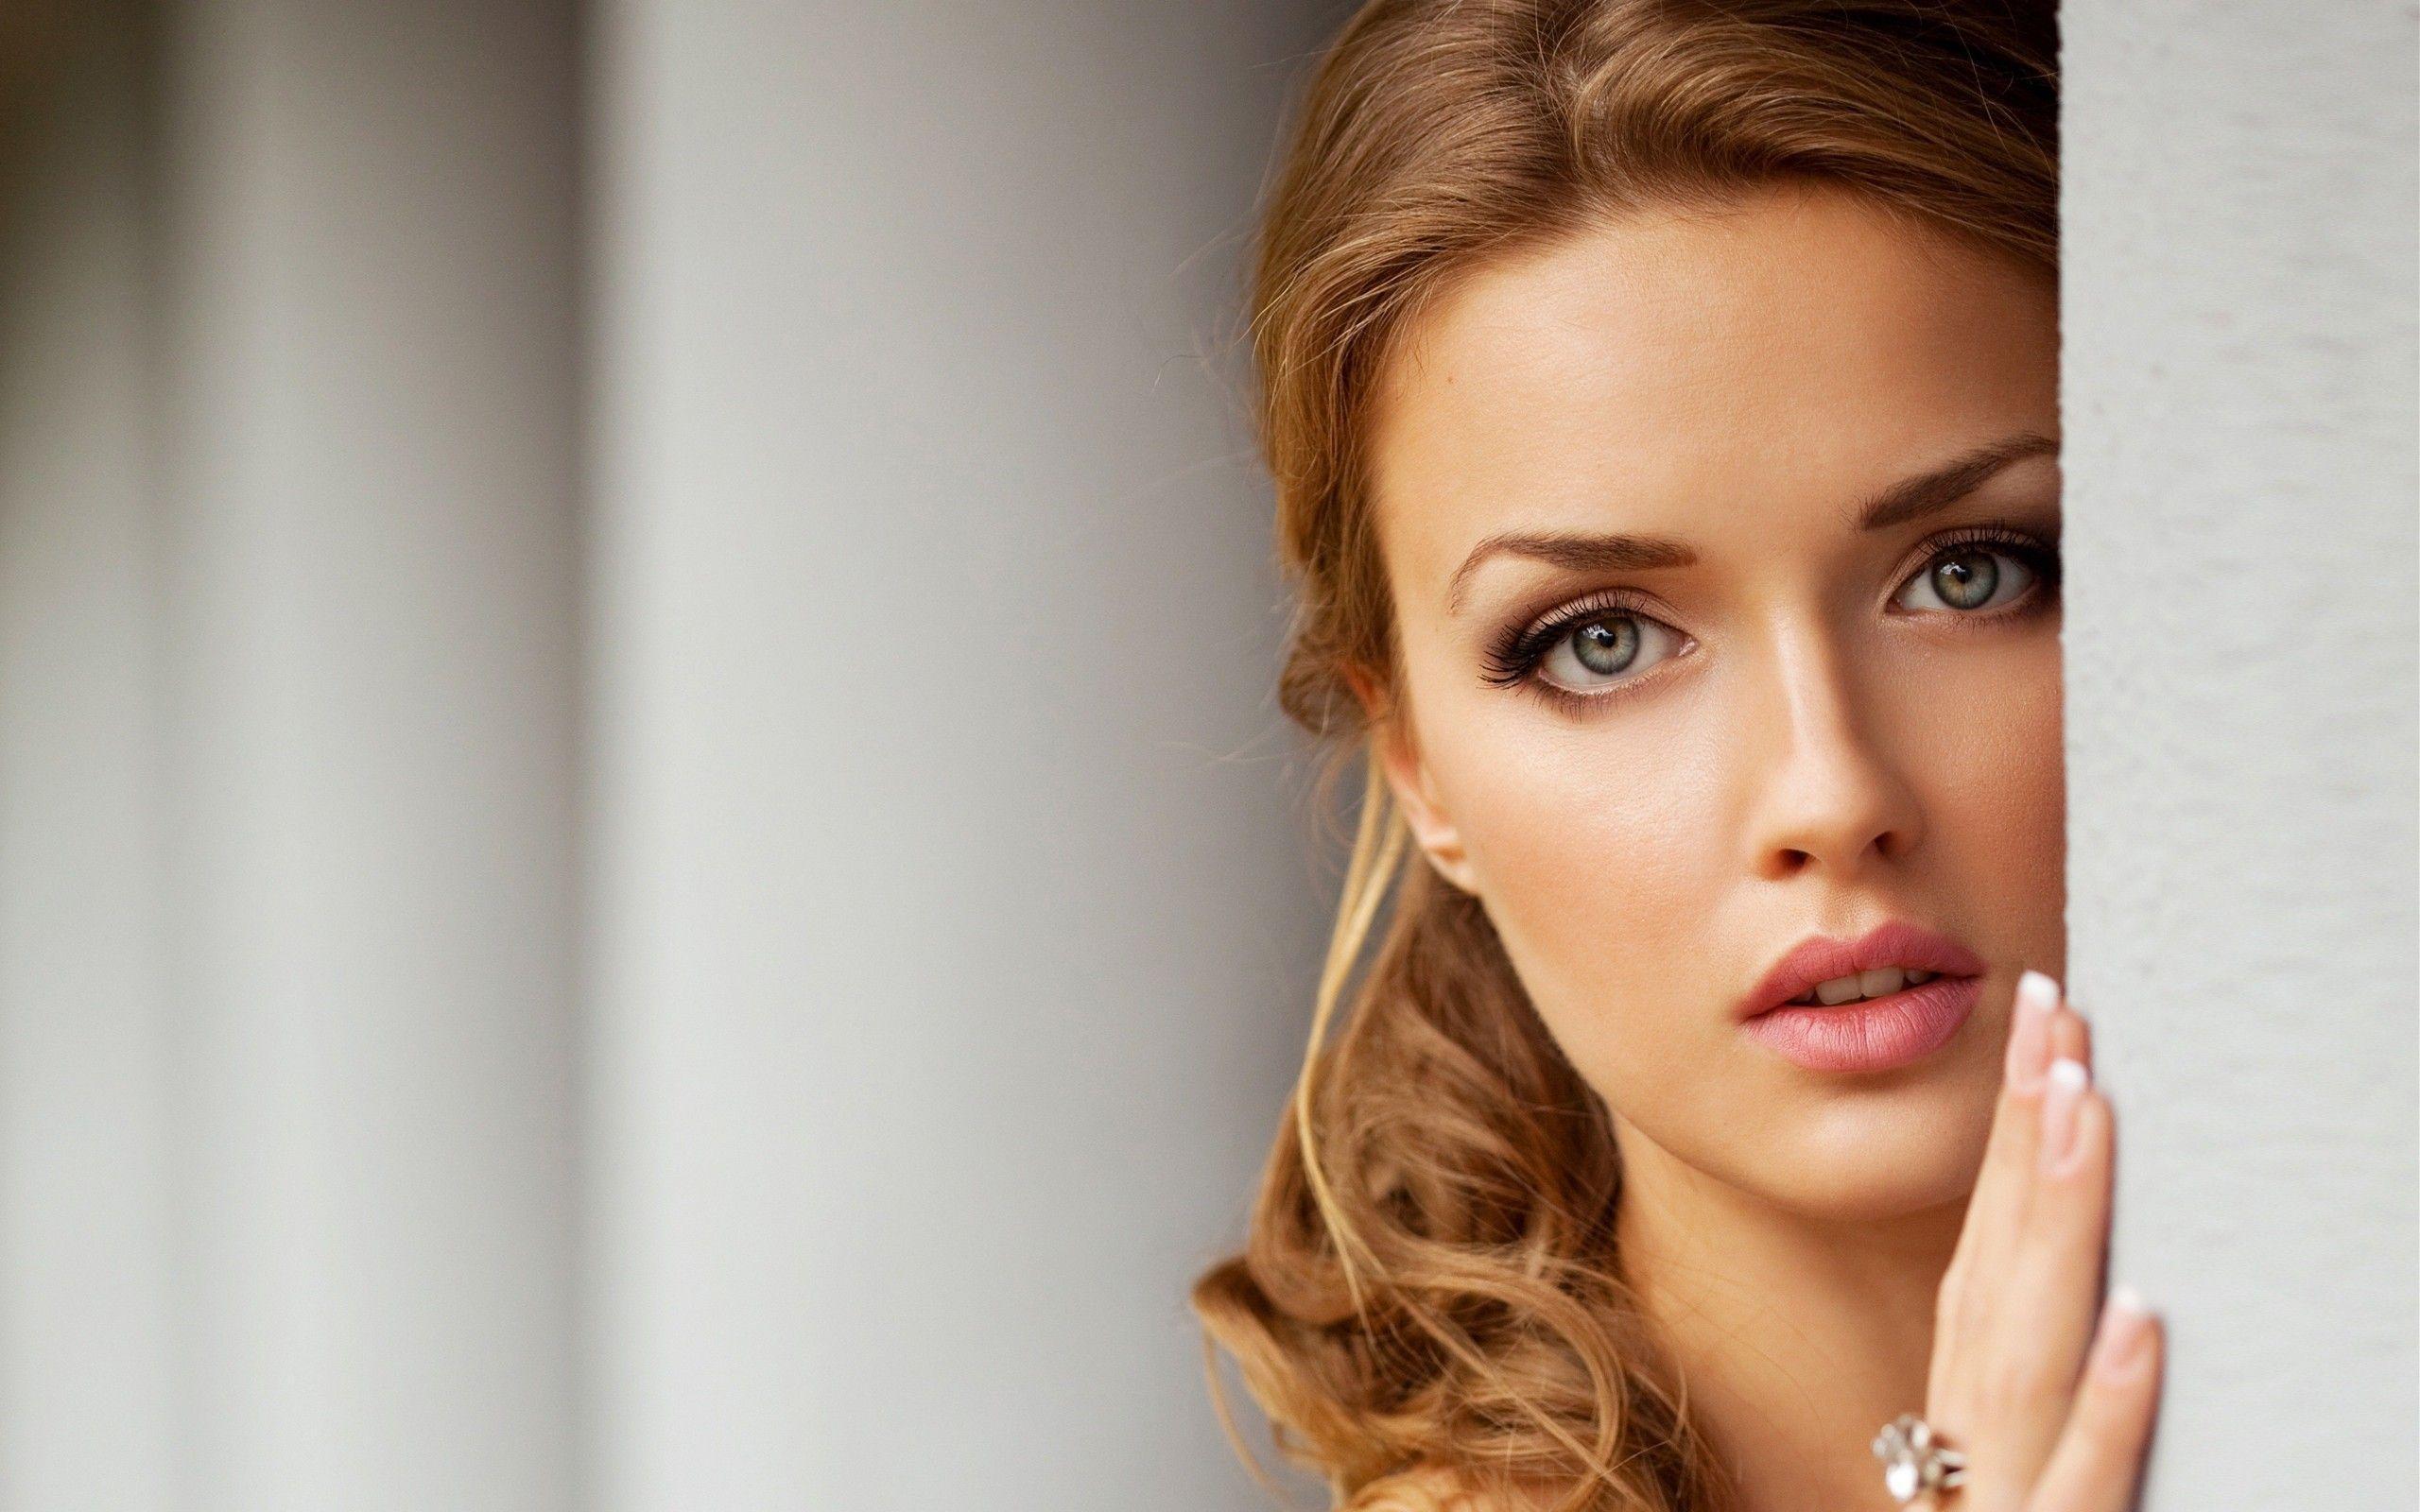 Beautiful Women Faces Wallpaper - WallpaperSafari